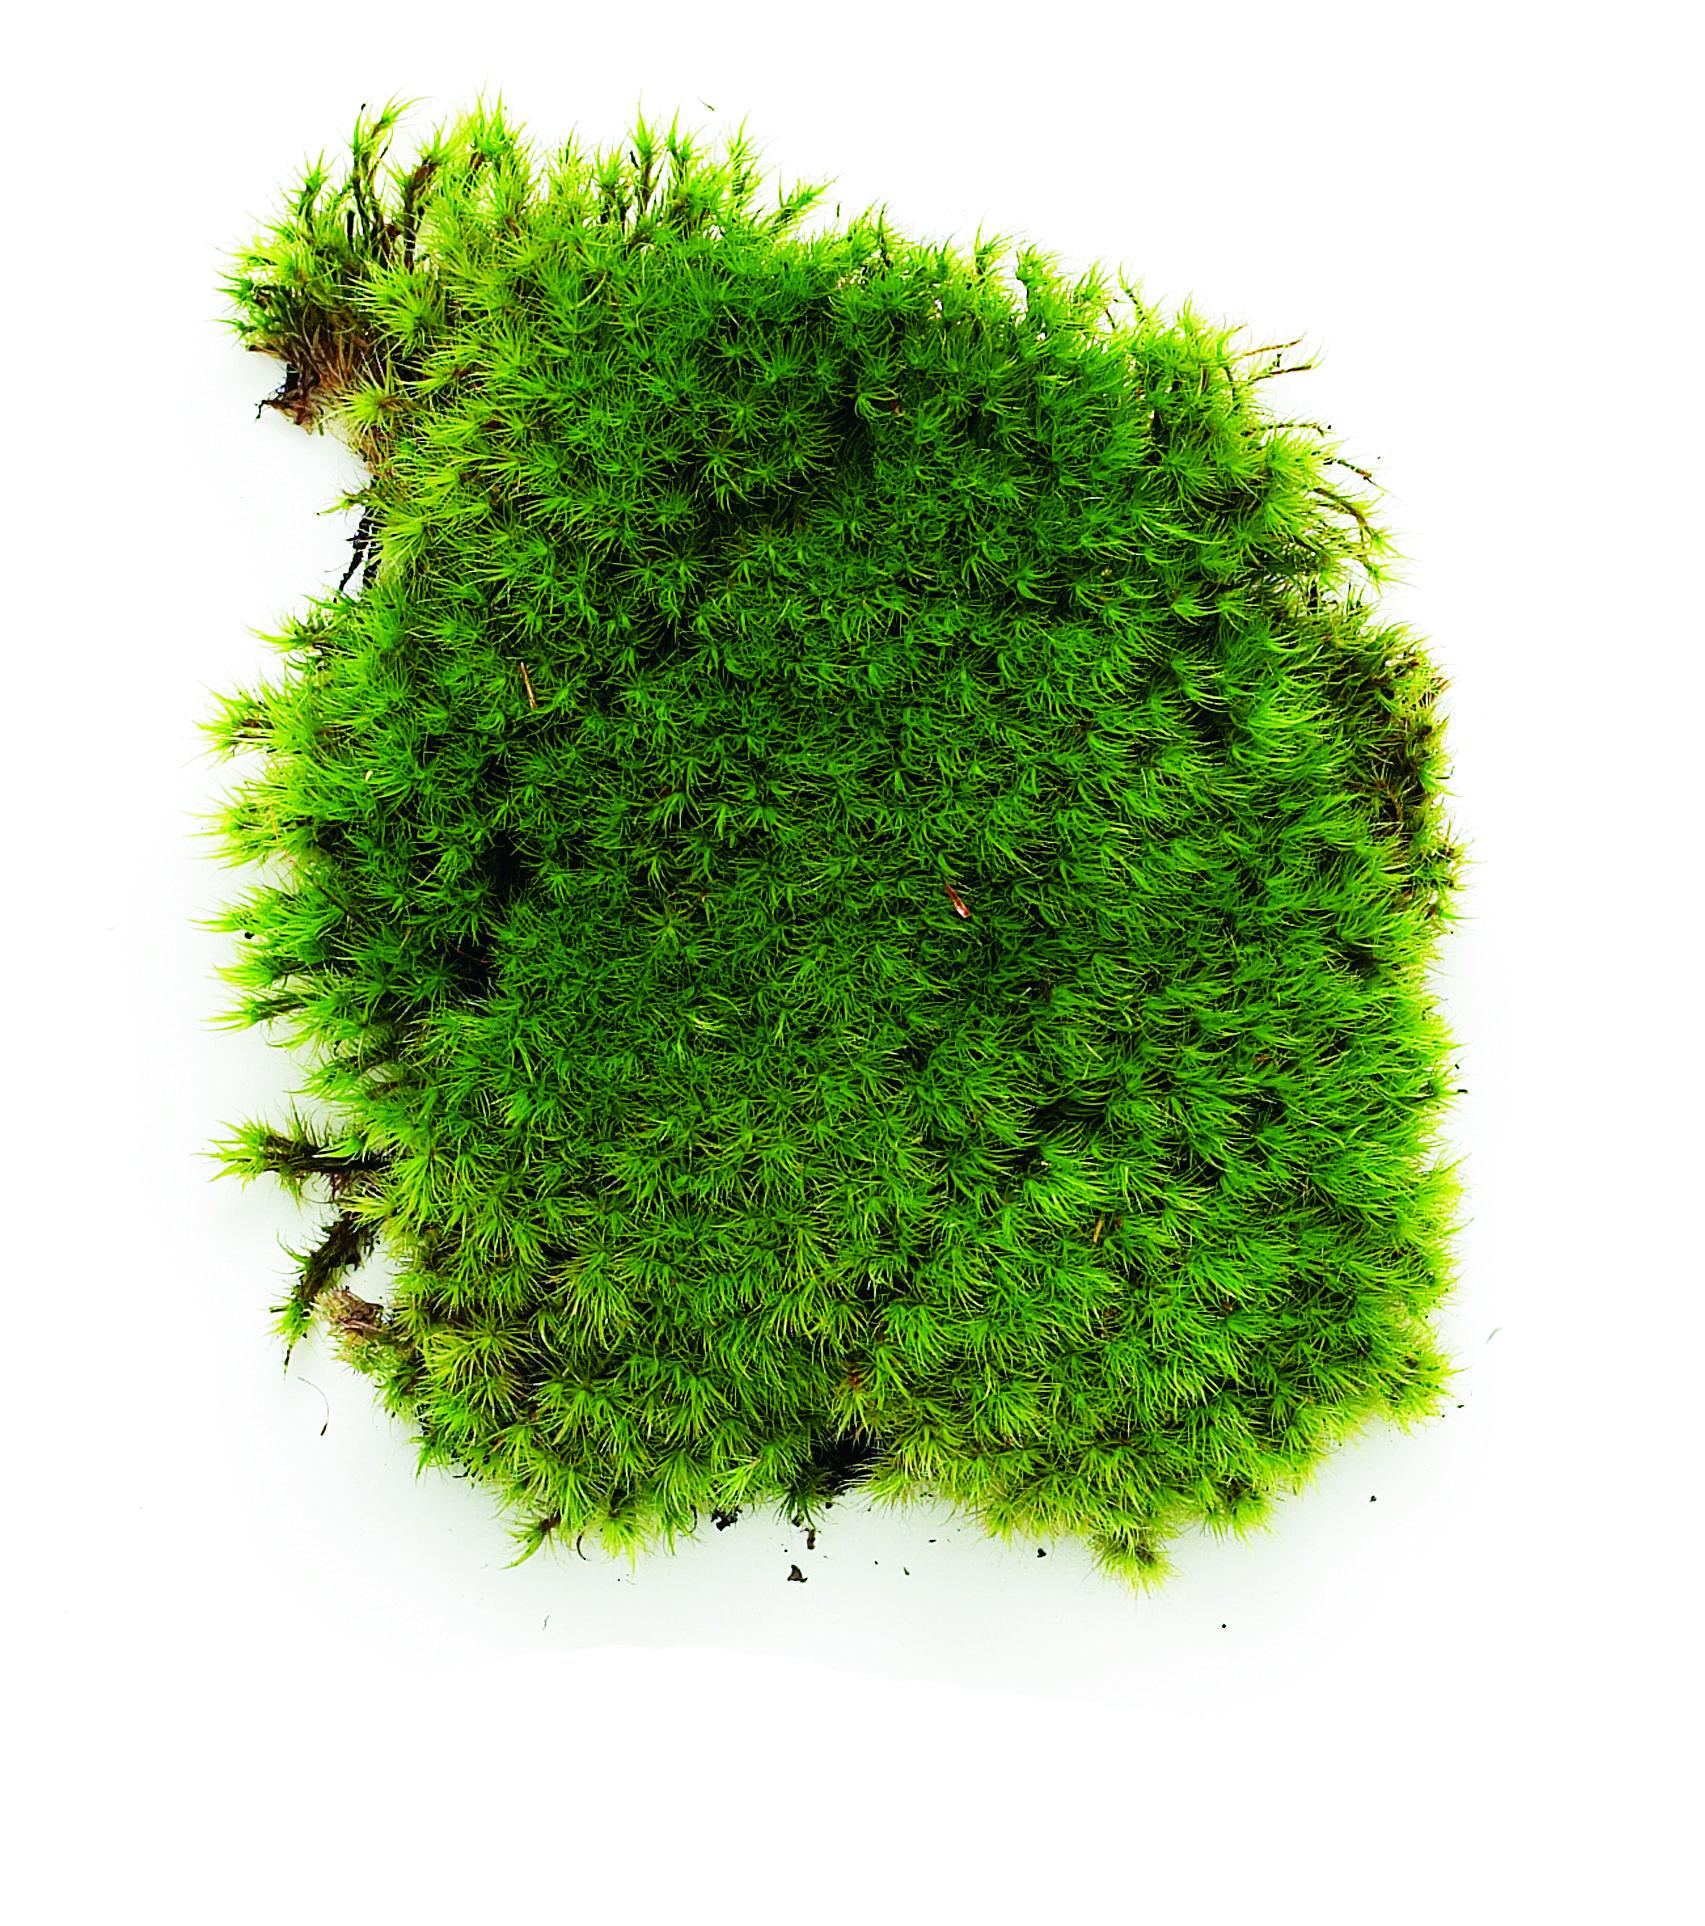 Rock Cap Moss (Dicranum) Will Prosper In Deep Shade